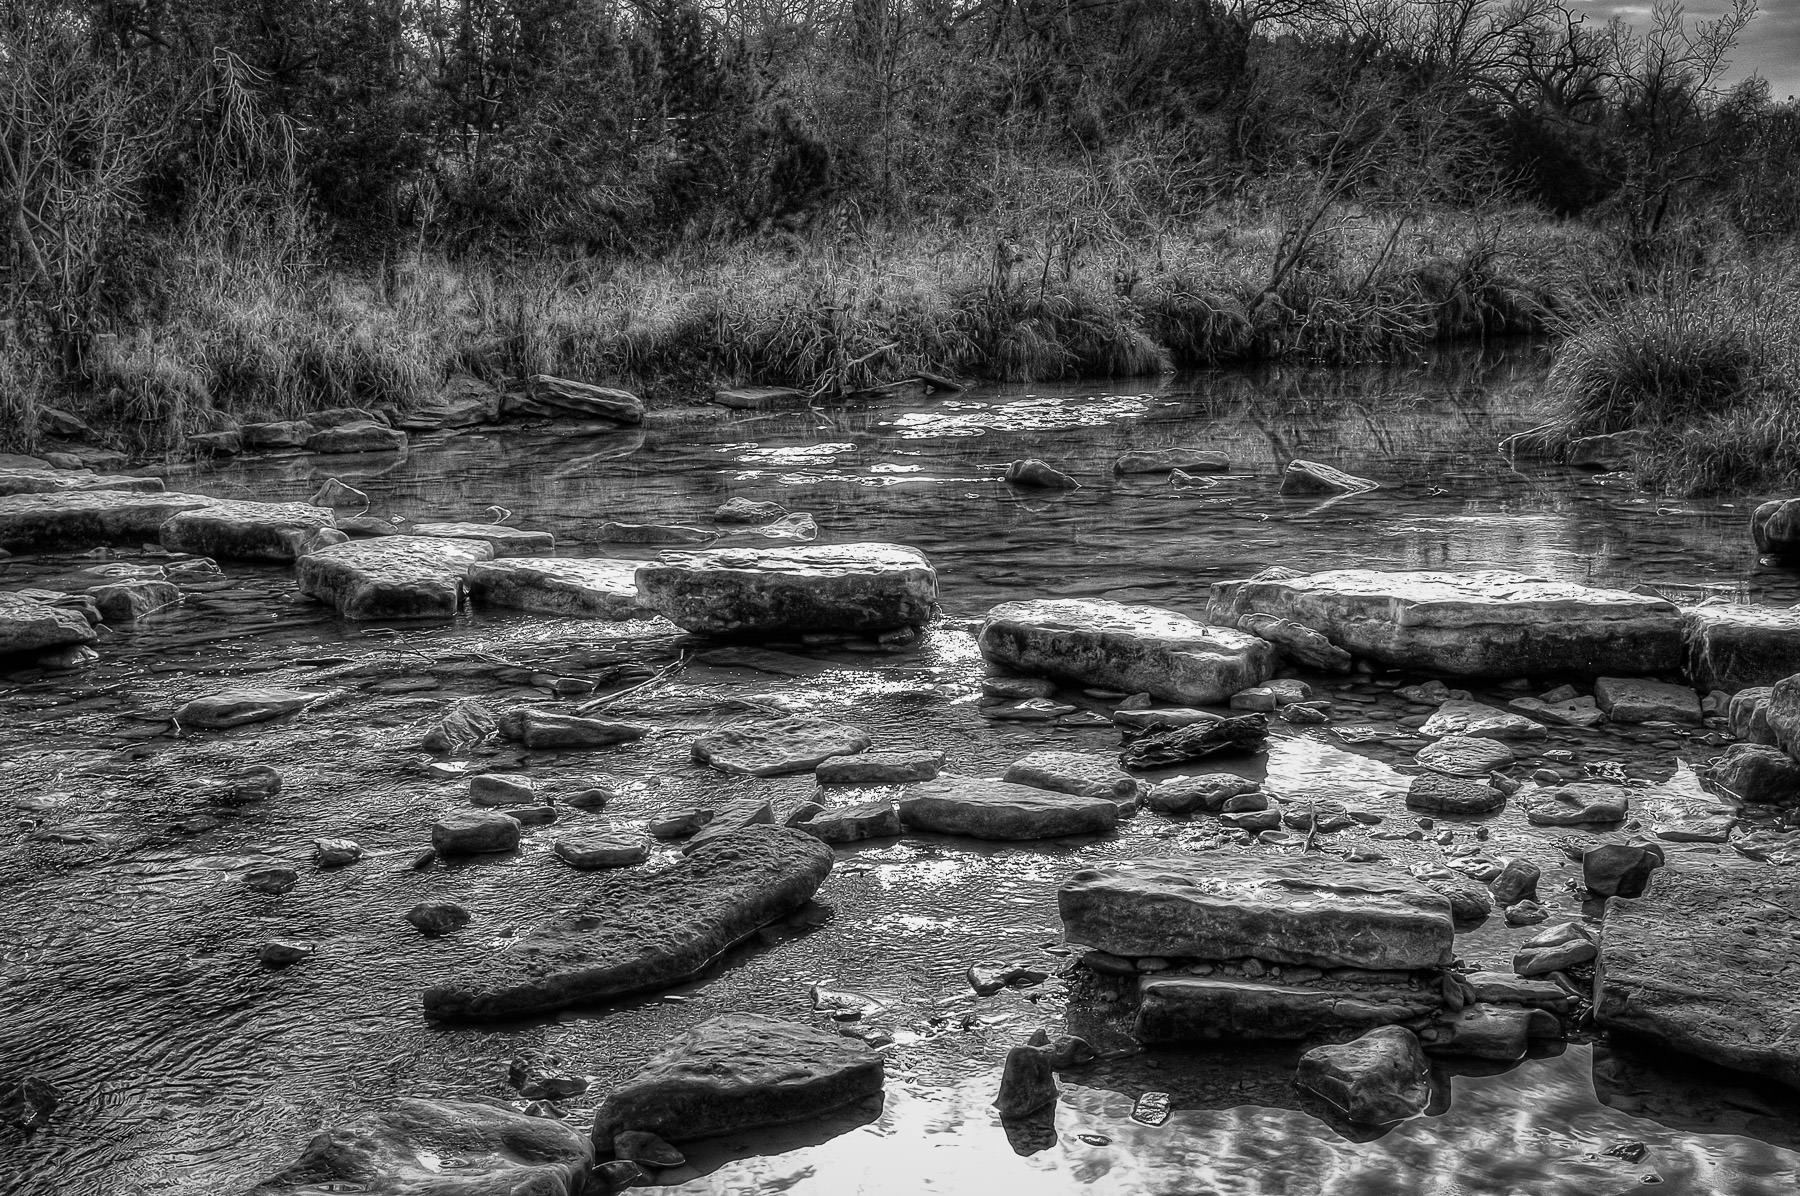 The Paluxy River flows through Texas' Dinosaur Valley State Park.